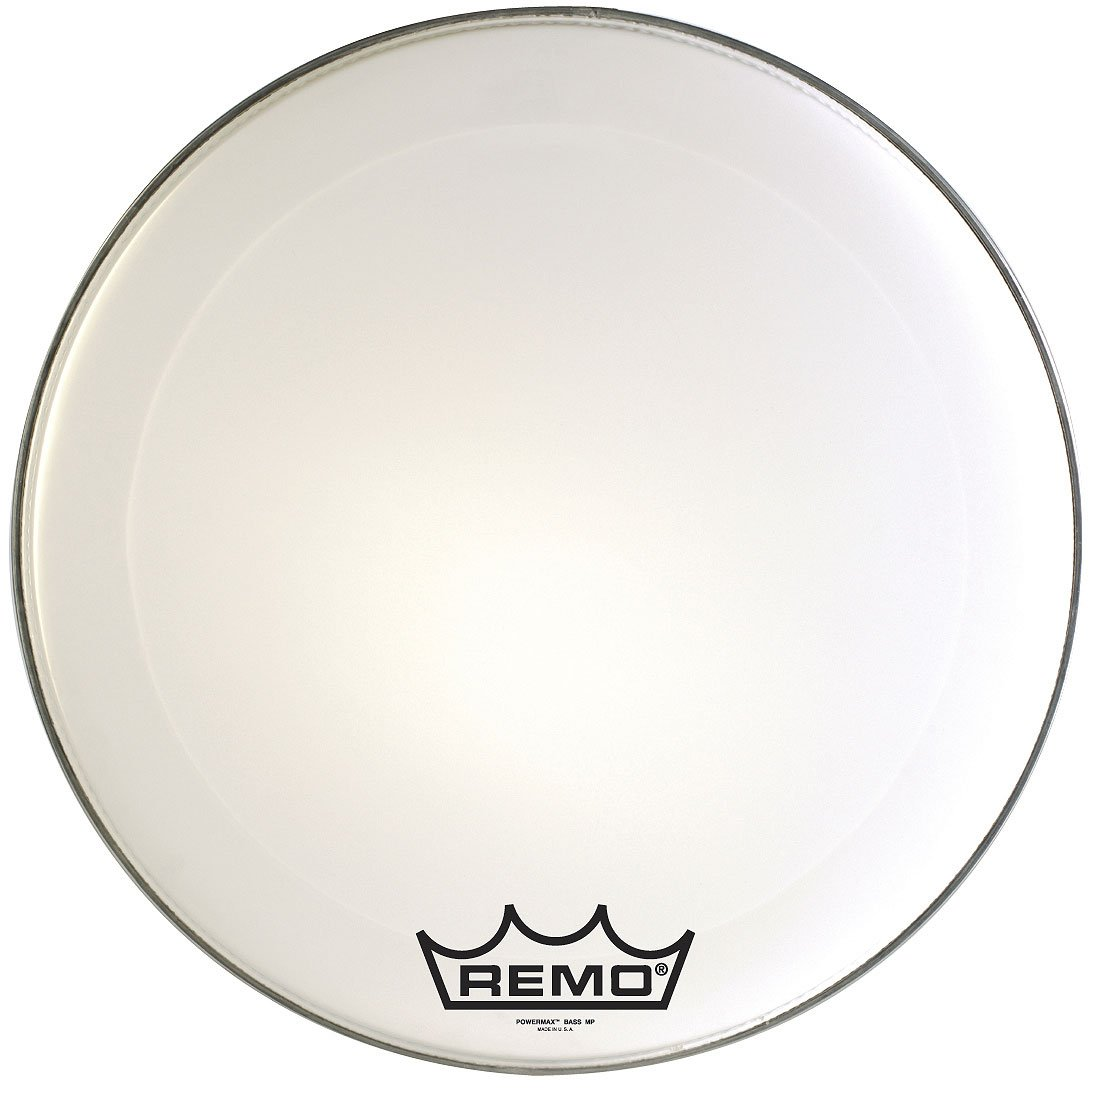 Remo PM2022-MP-U Powermax 2 Ultra White Crimp lock Bass Drumhead, 22''